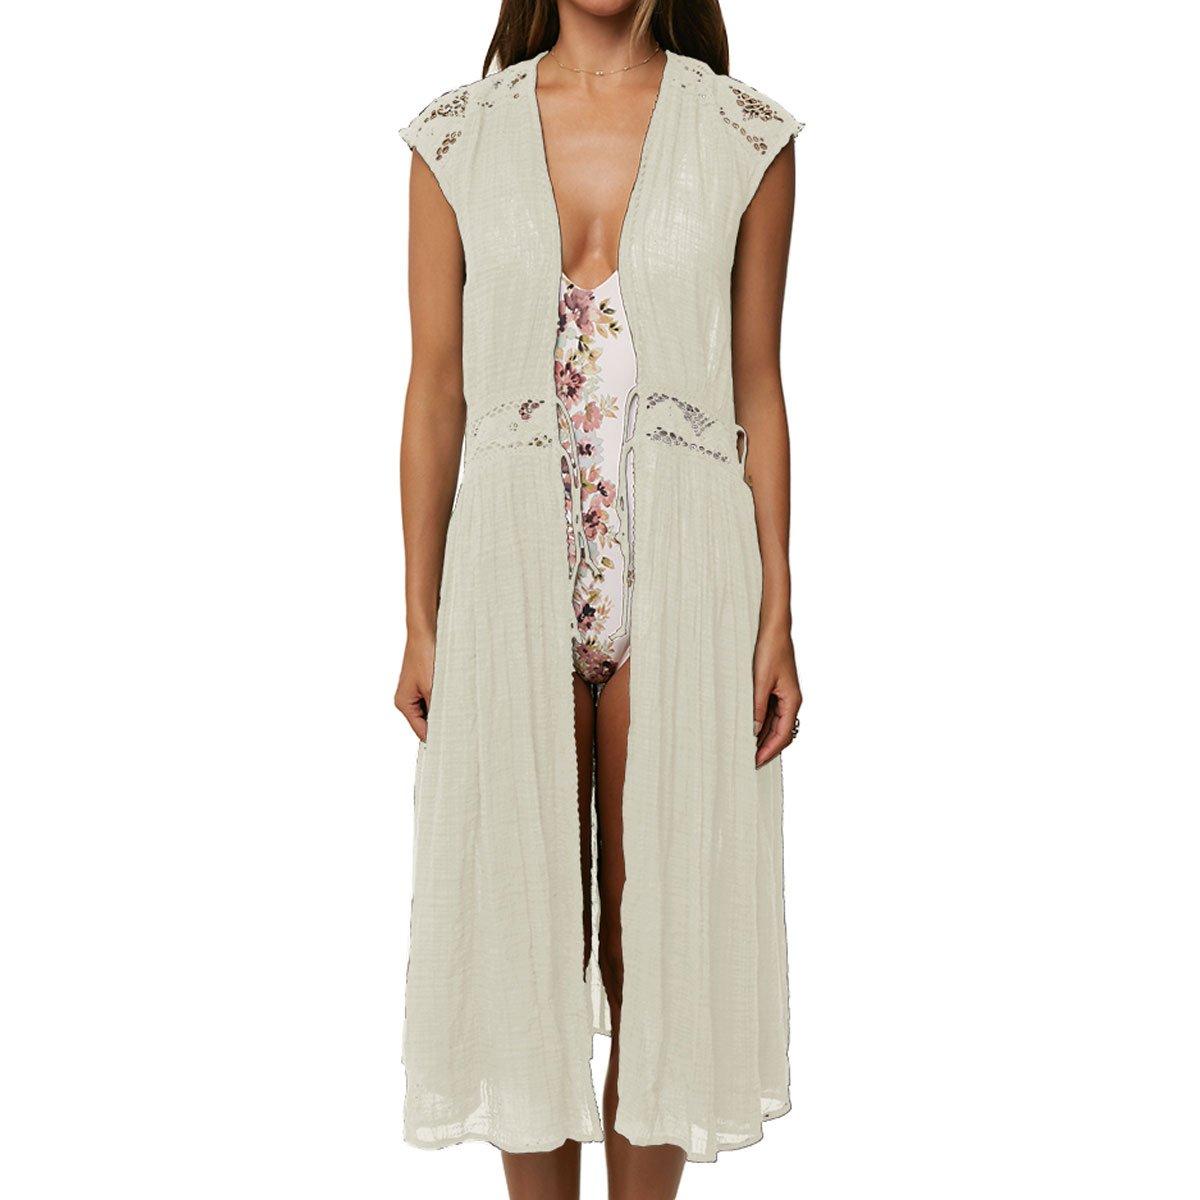 99b1bc26b O'Neill Women's Lillian Maxi Cover Up at Amazon Women's Clothing store: